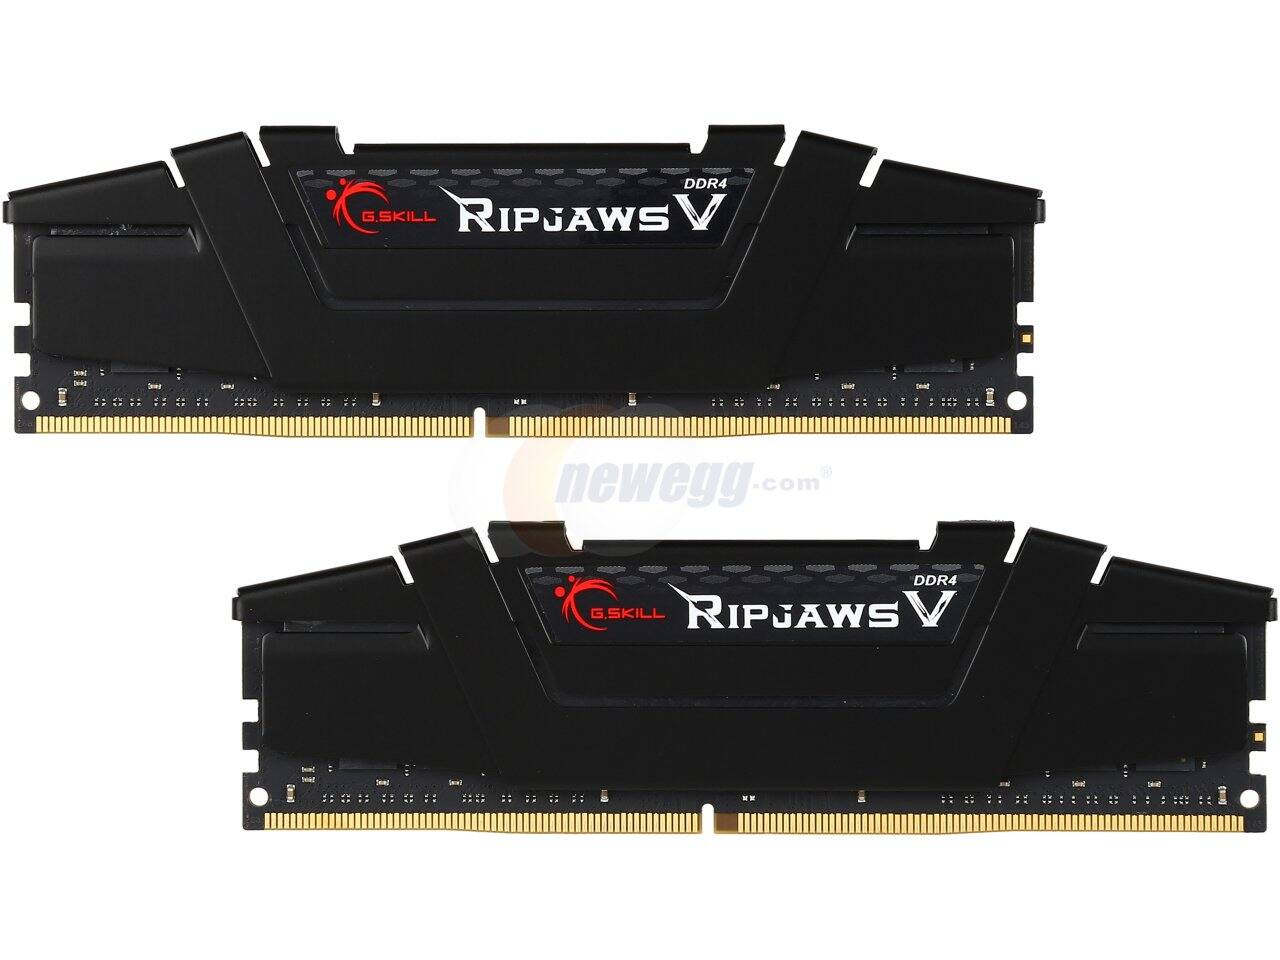 G.SKILL Ripjaws V Series 16GB (2 x 8GB) 288-Pin DDR4 SDRAM DDR4 3400 (PC4 27200) - at newegg for $84.99